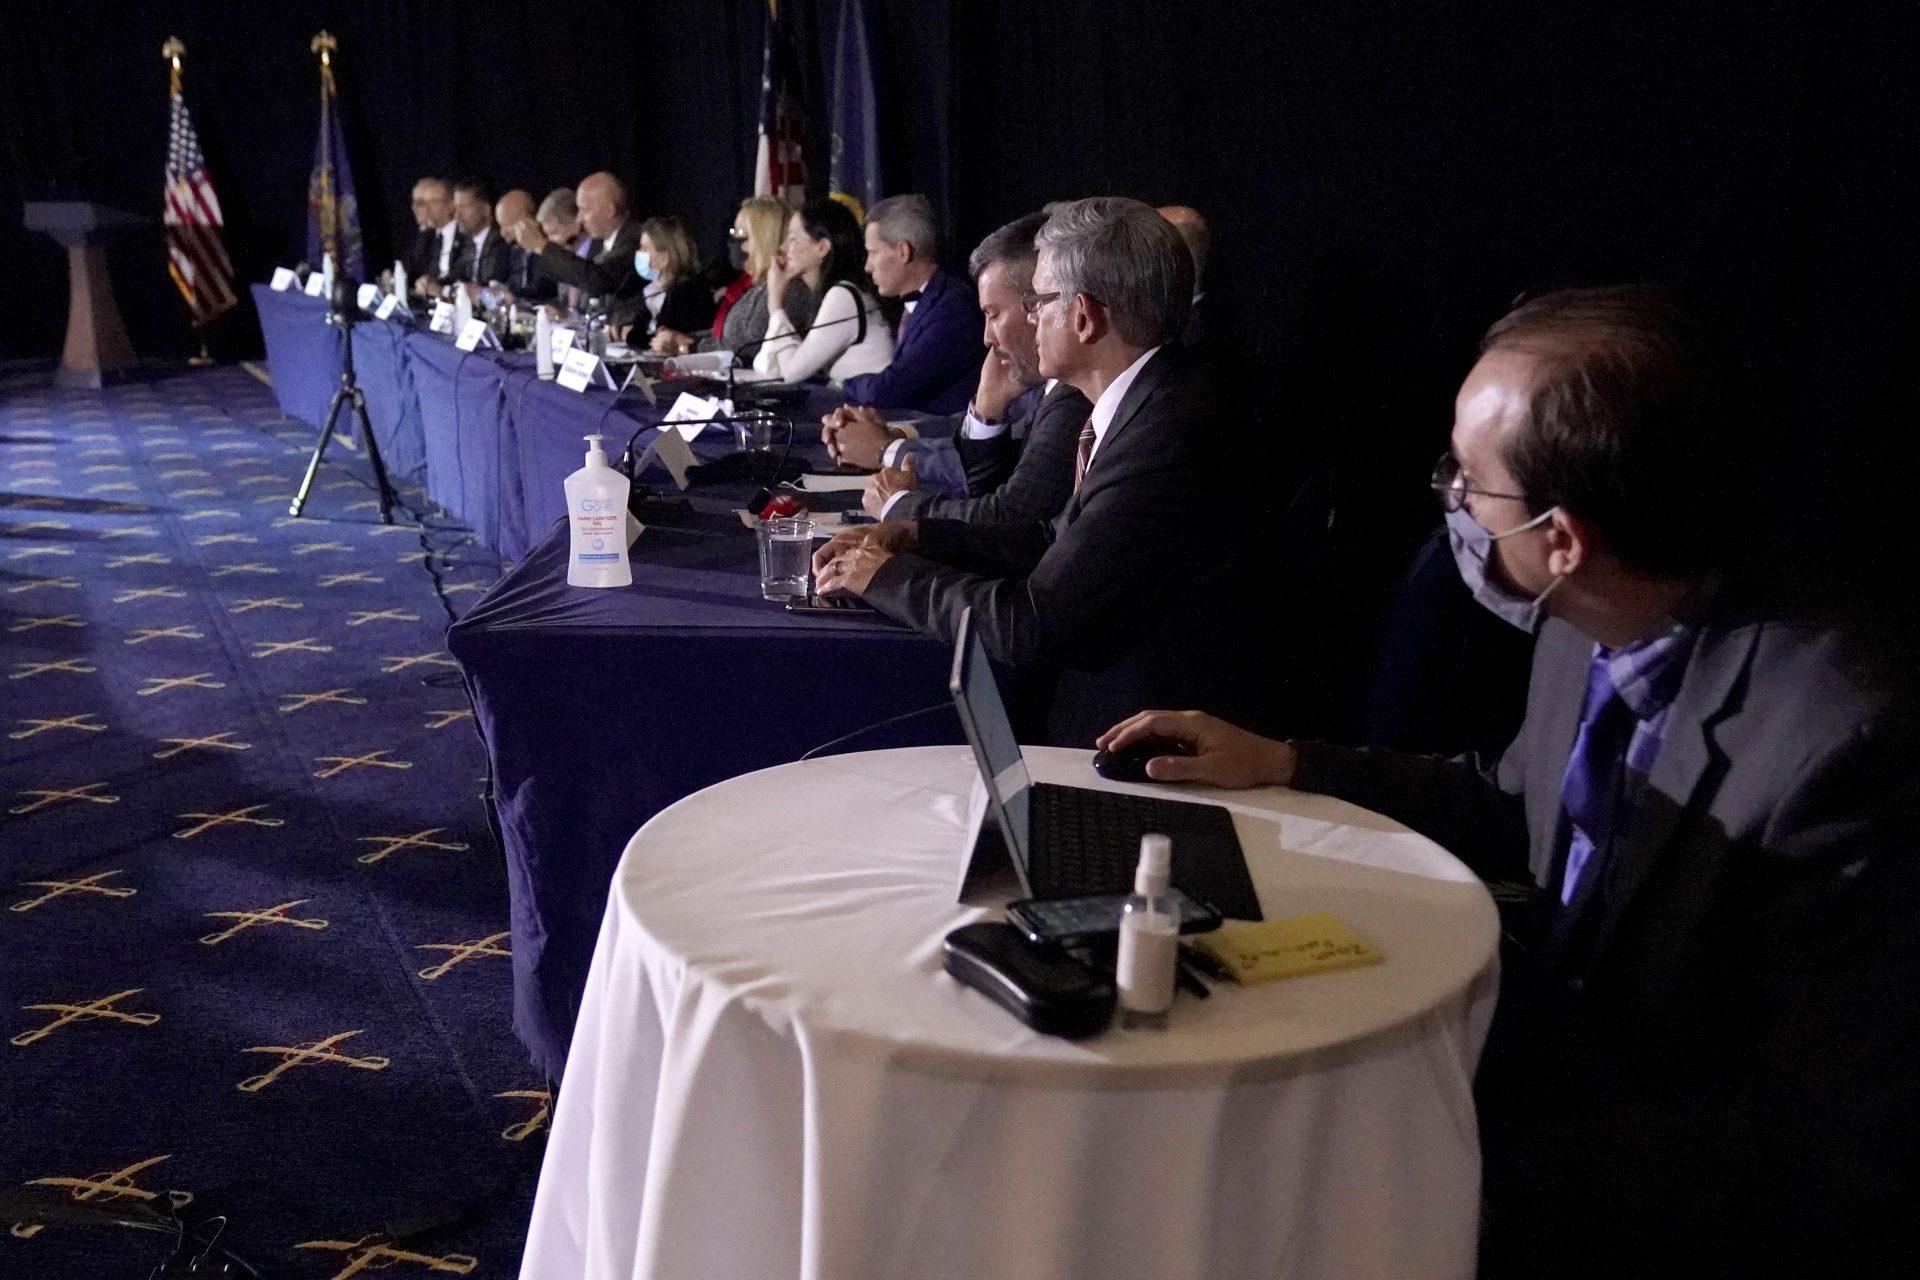 Members of the Pennsylvania State Senate Majority Policy Committee listen to Rudy Giuliani speak, Wednesday, Nov. 25, 2020, in Gettysburg, Pa.